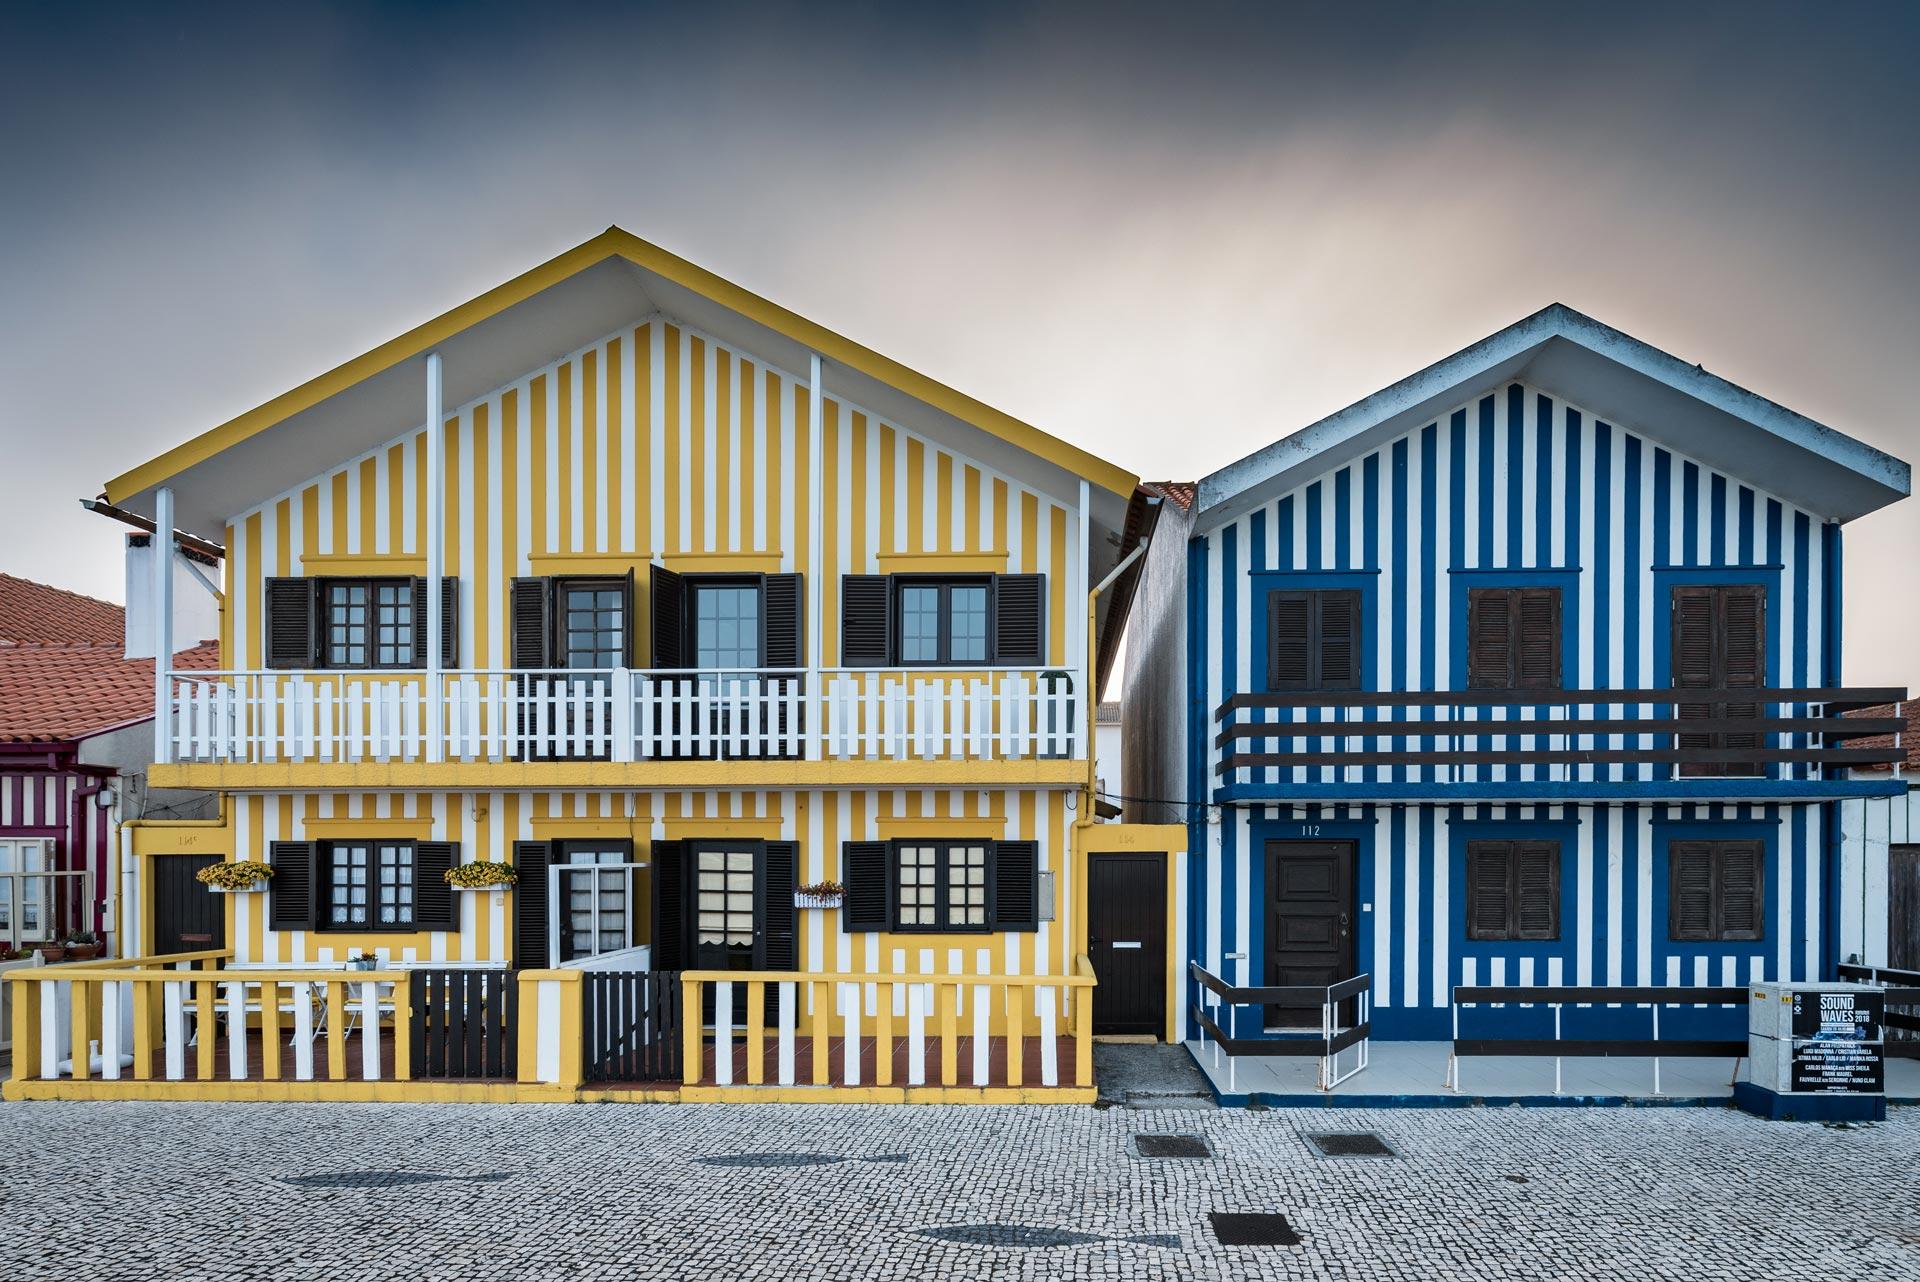 Paesaggi-Portogallo - DSC 2274 - Case a strisce Aveiro - Case a strisce Aveiro